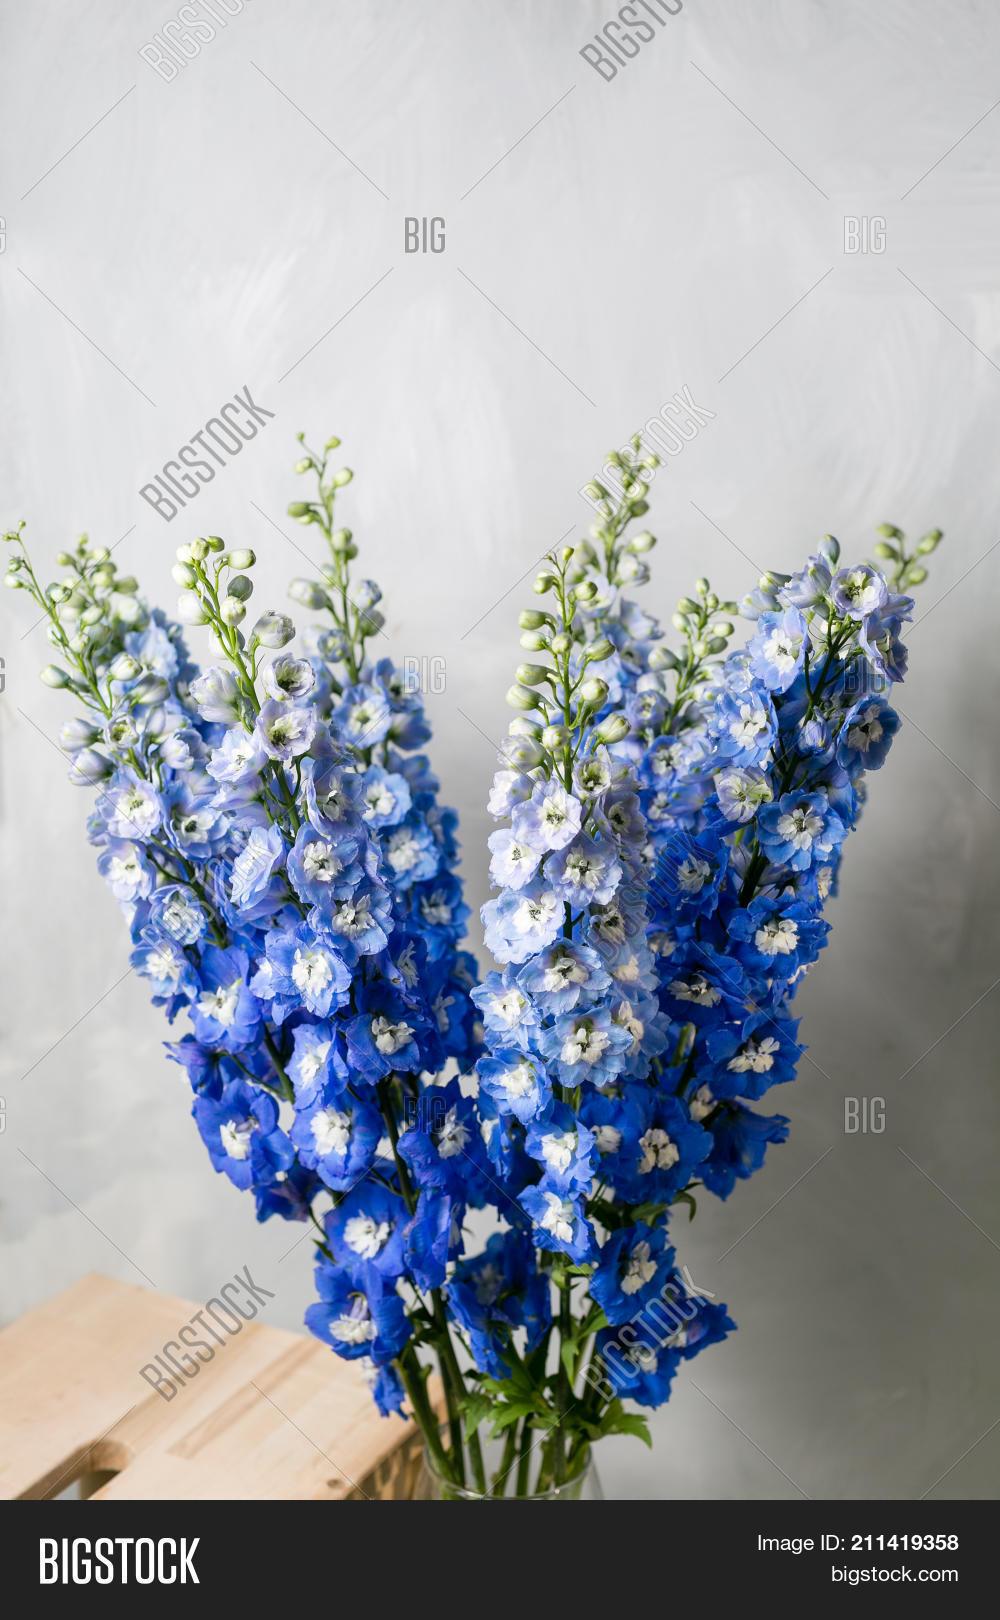 Blue Delphinium Flower Image Photo Free Trial Bigstock